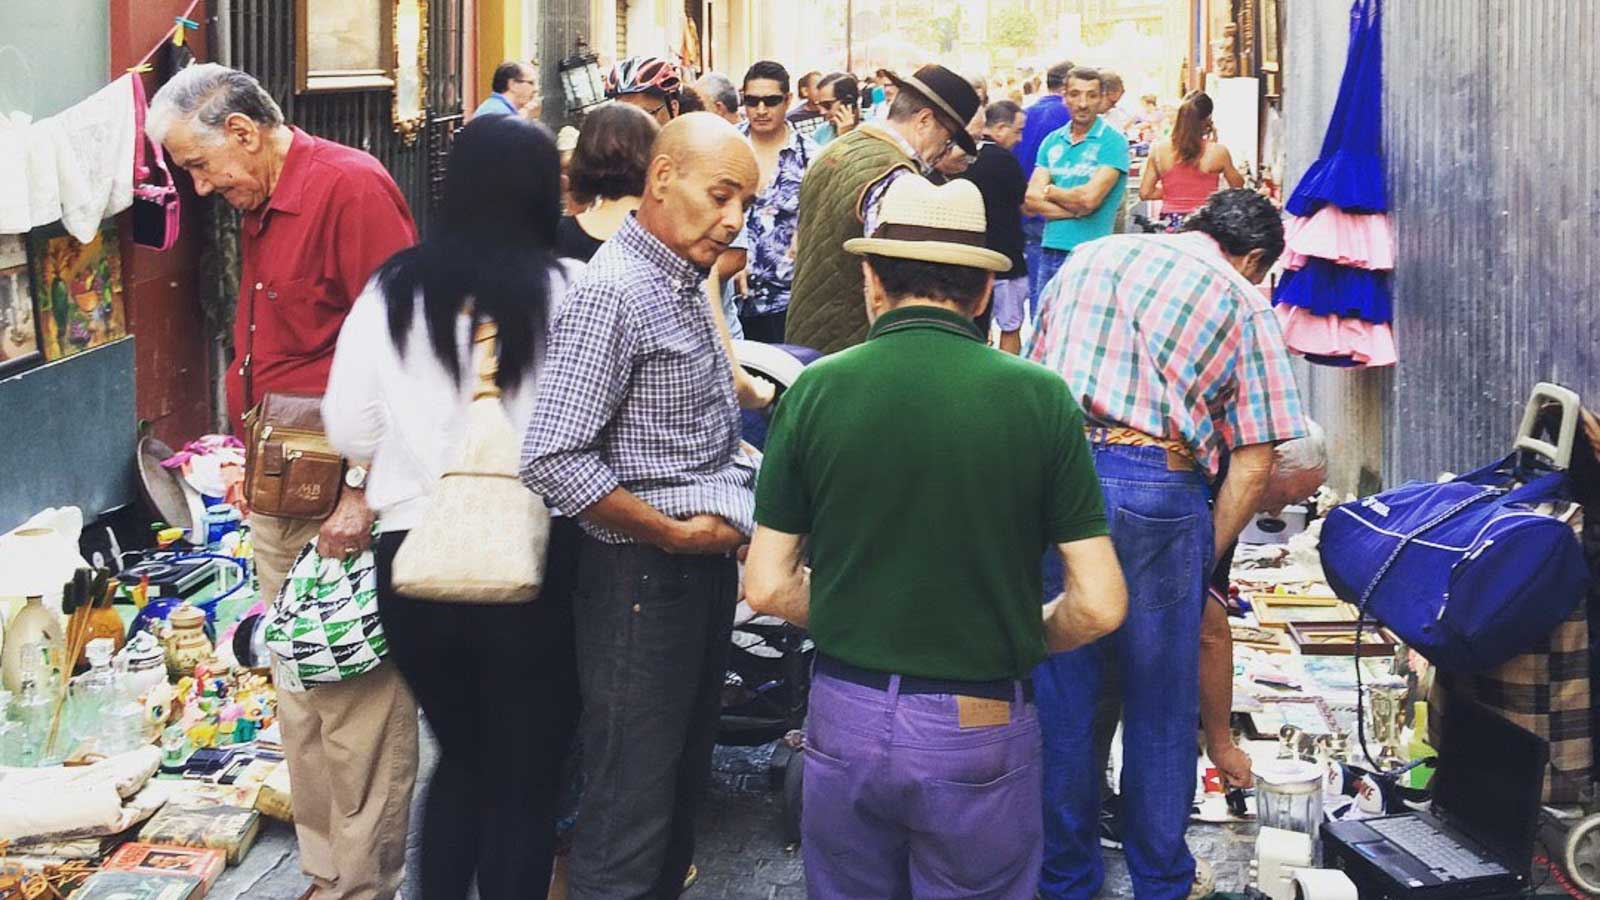 seville feria street craft market